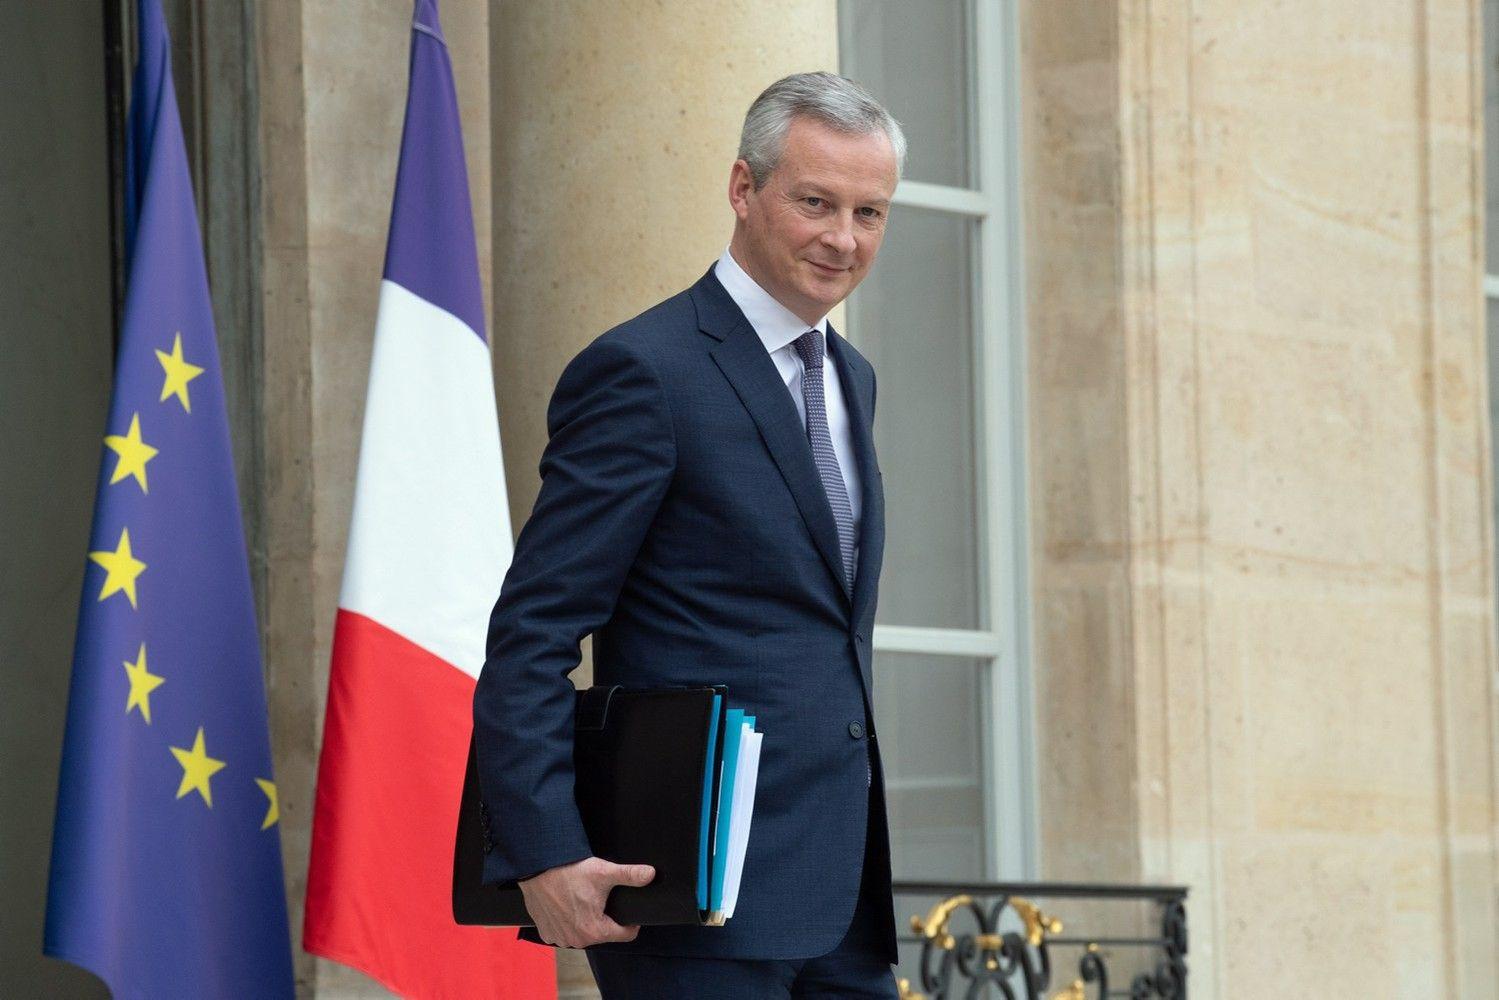 Prancūzija nebelauks ES sprendimo, kitąmet apmokestins JAV milžines